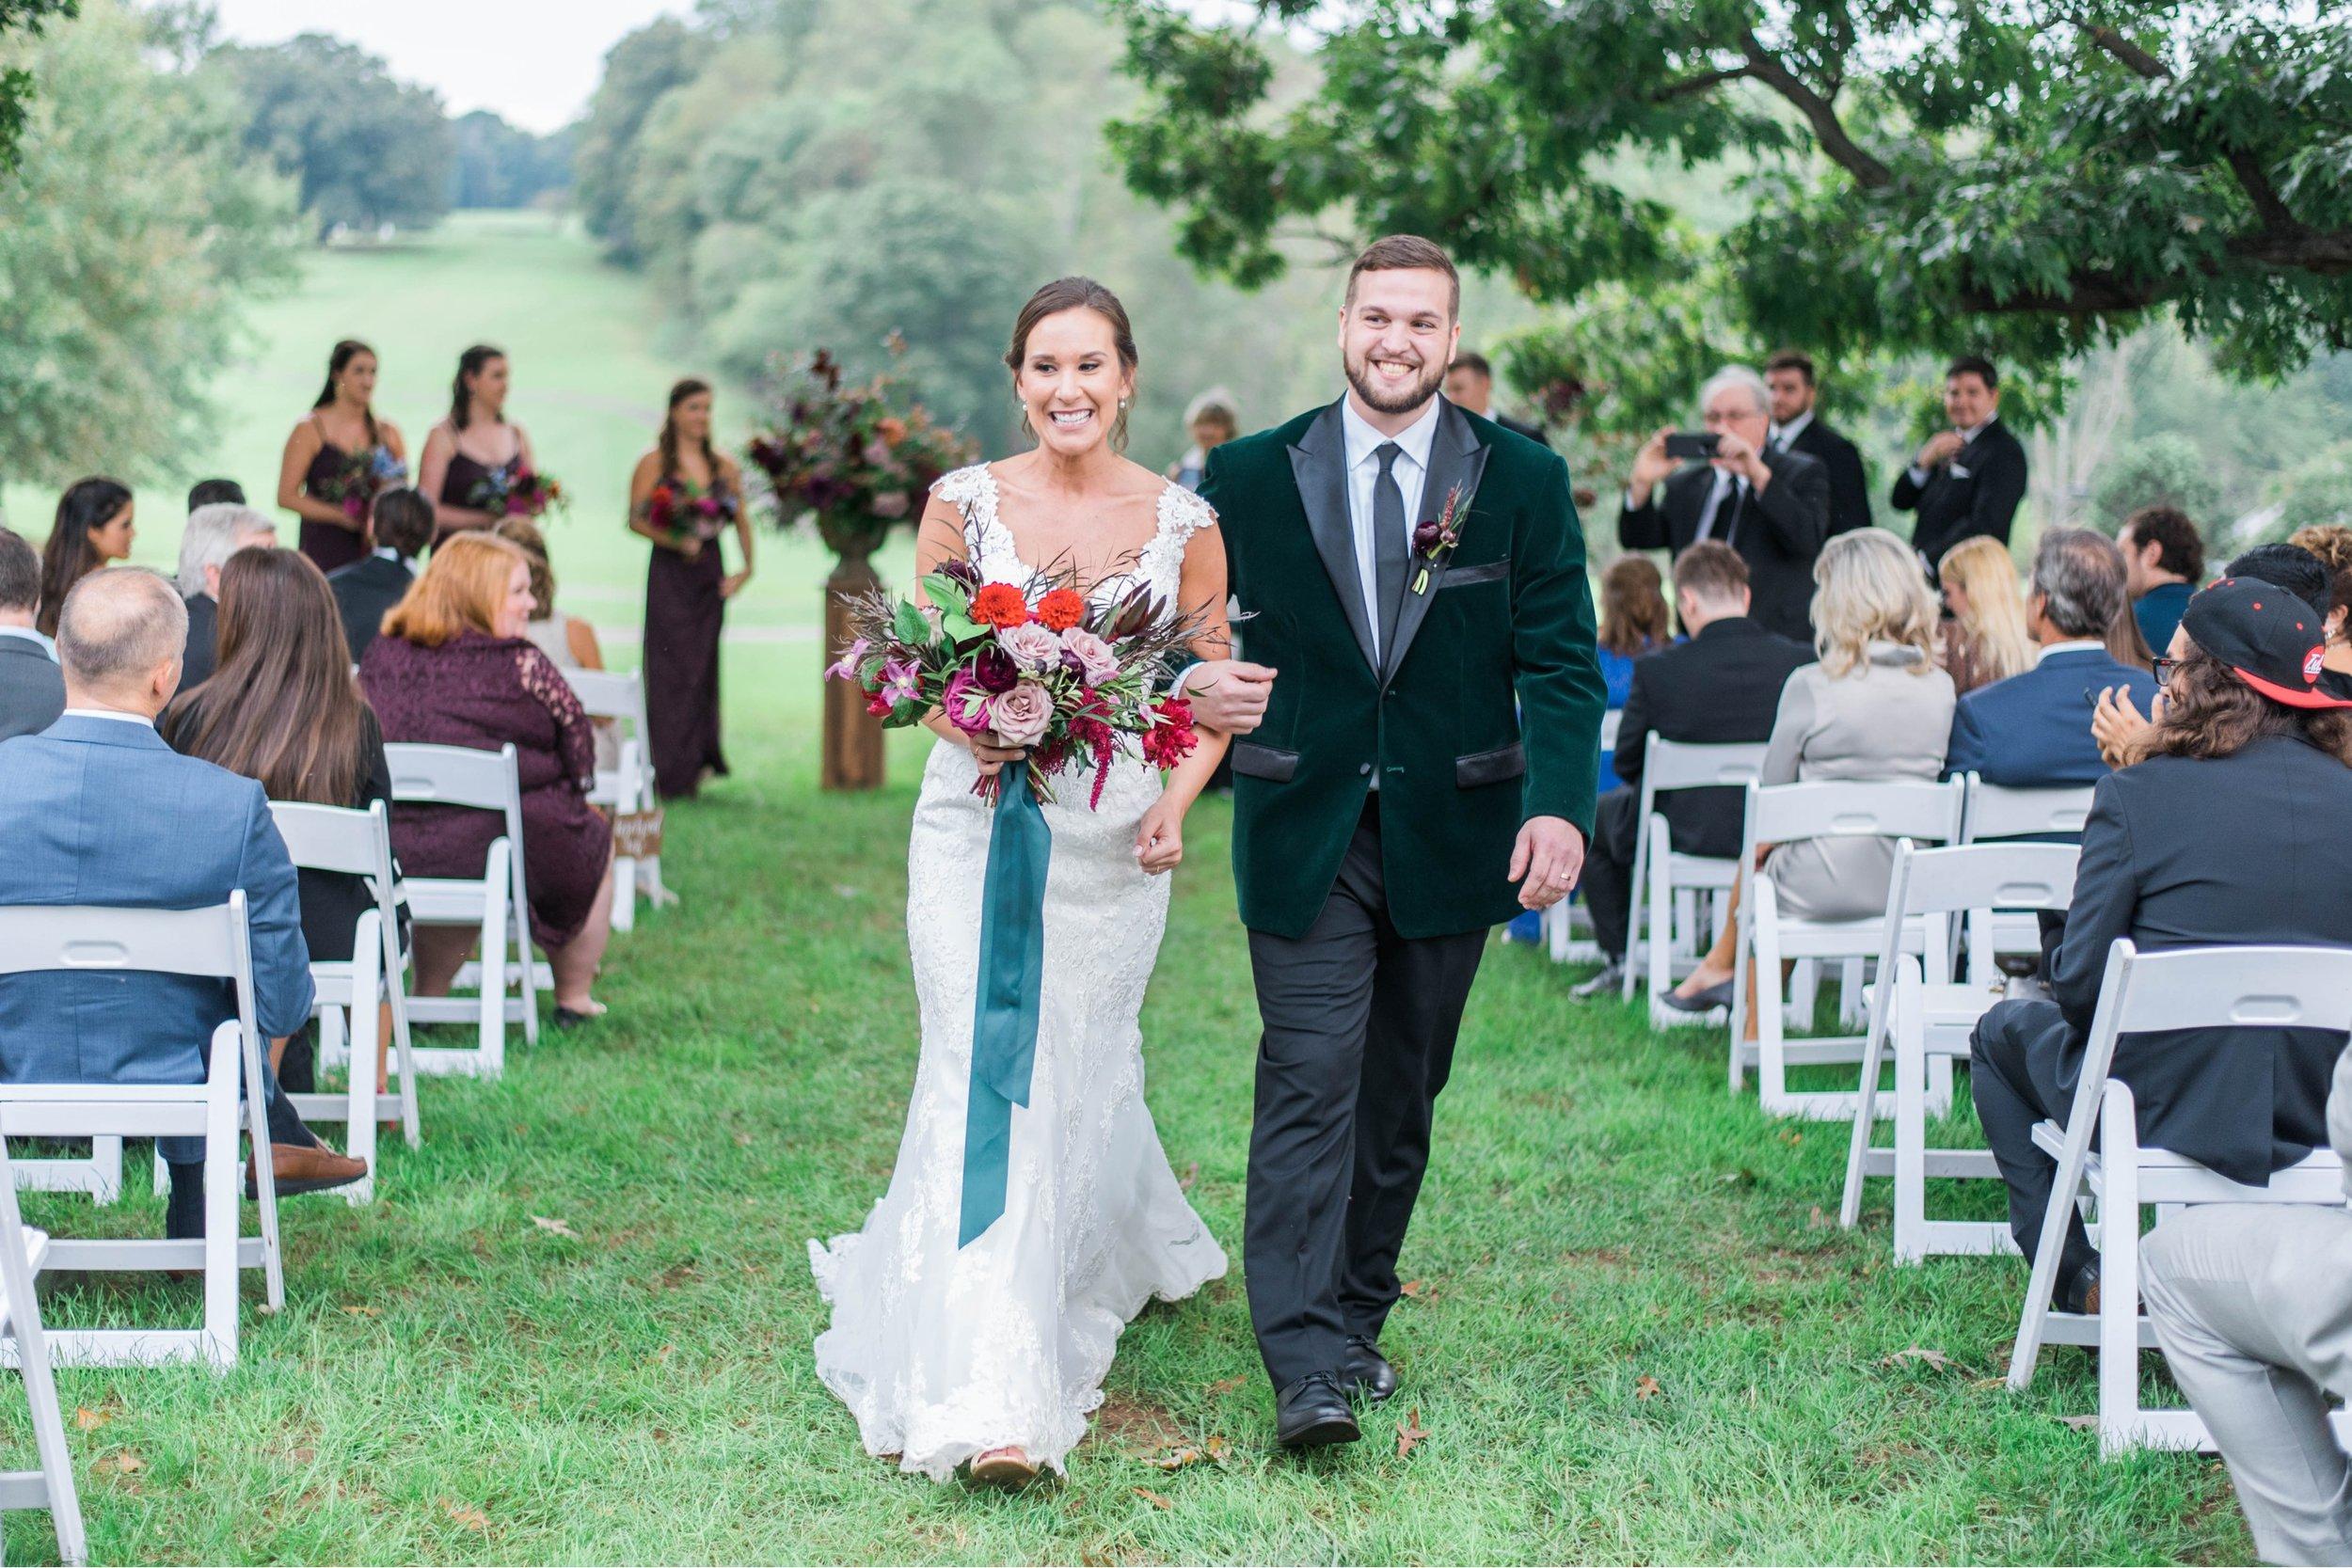 Gordan+Lauren_BoonsboroCountryClubWedding_Virginiaweddingphotographer_LynchburgVi 12.jpg